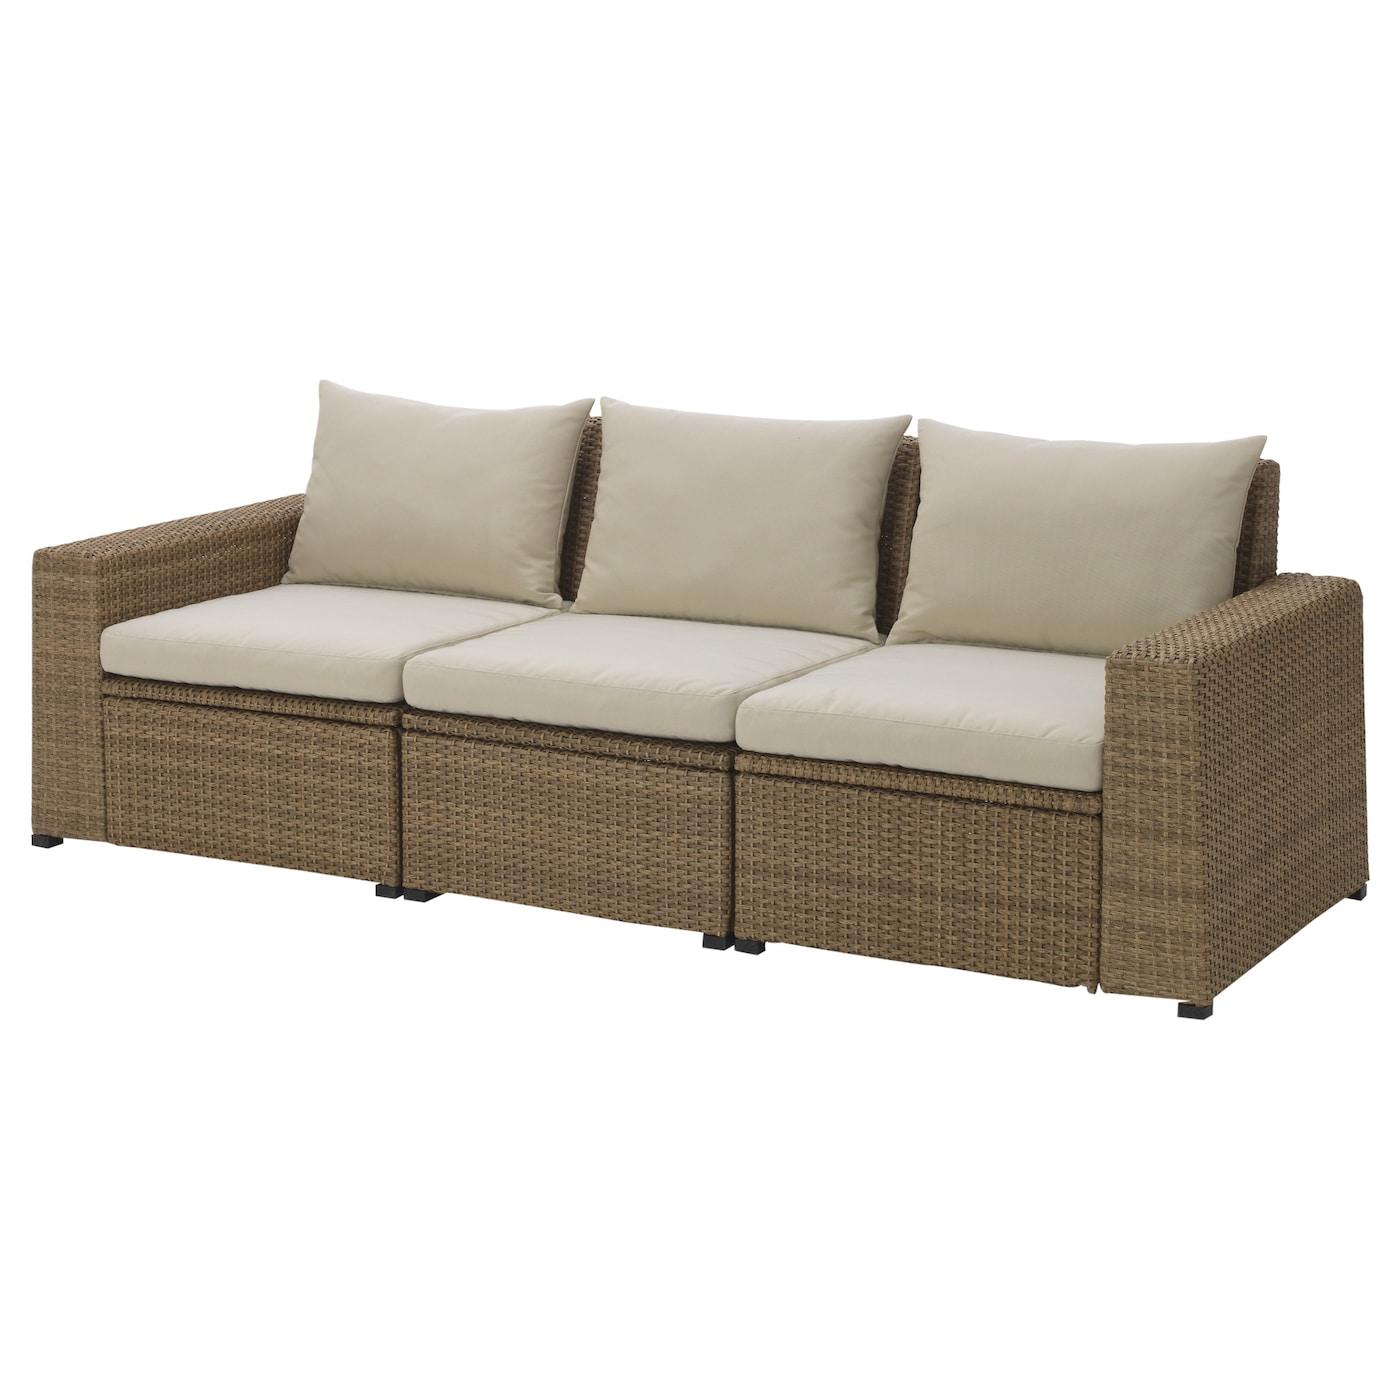 SOLLERÖN 3-seat modular sofa, outdoor, brown, Hållö beige